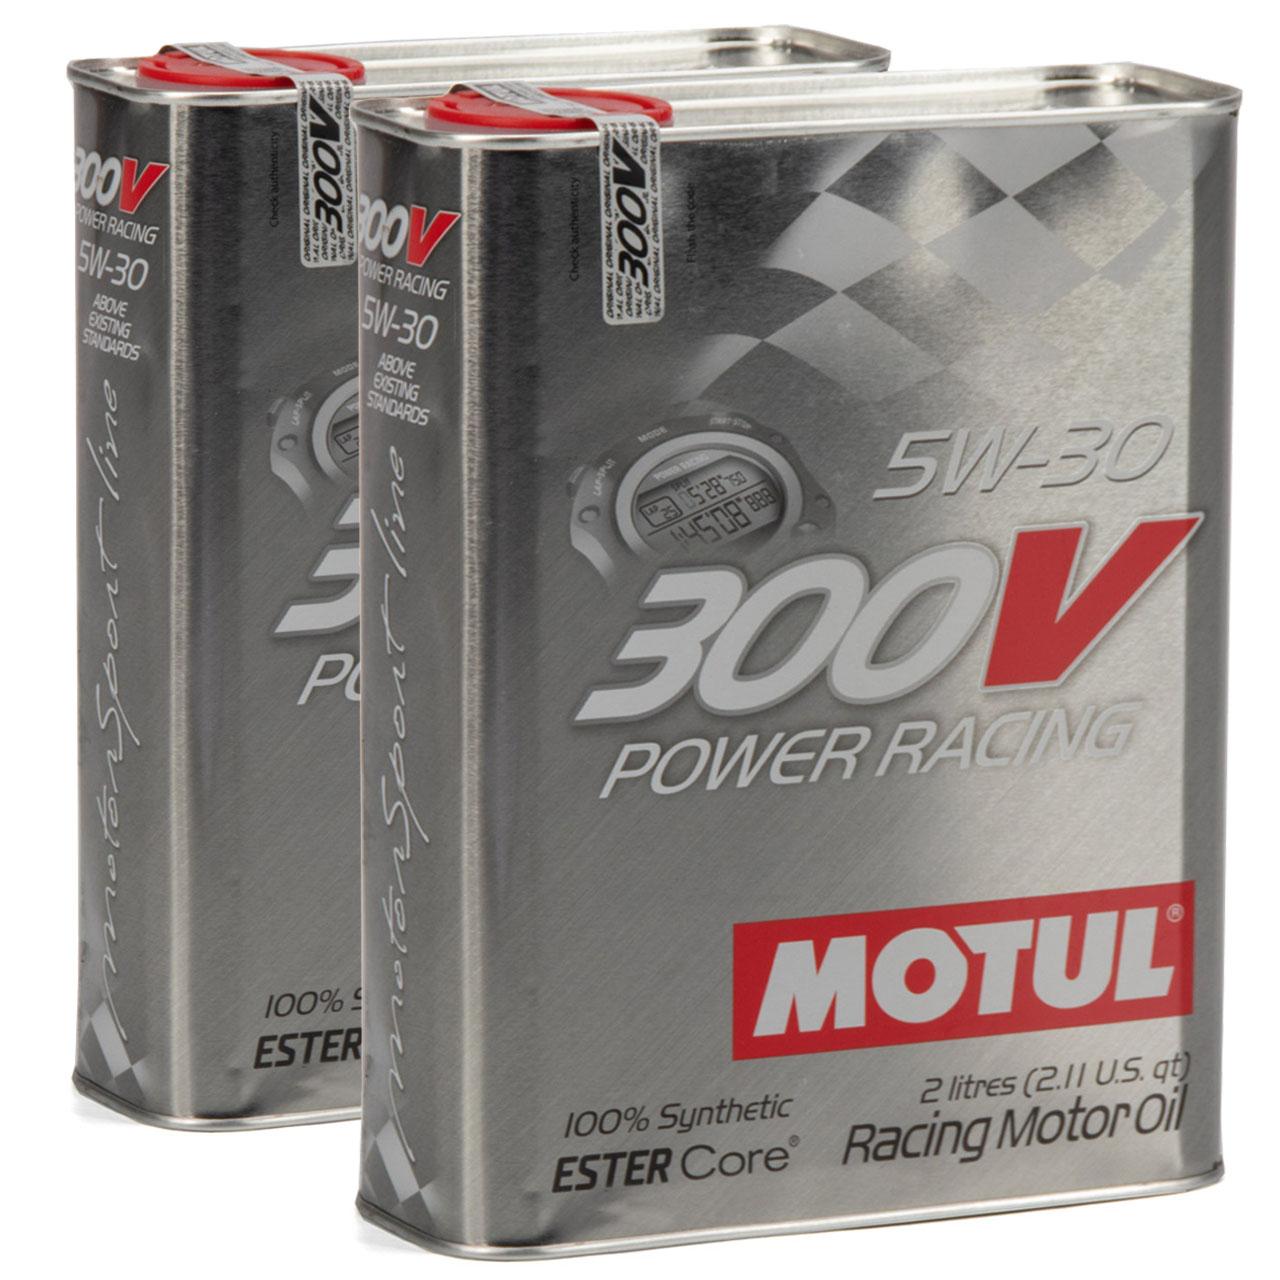 MOTUL 300V POWER RACING Motoröl Öl 5W30 100% Synthetic Ester Core - 4L 4 Liter